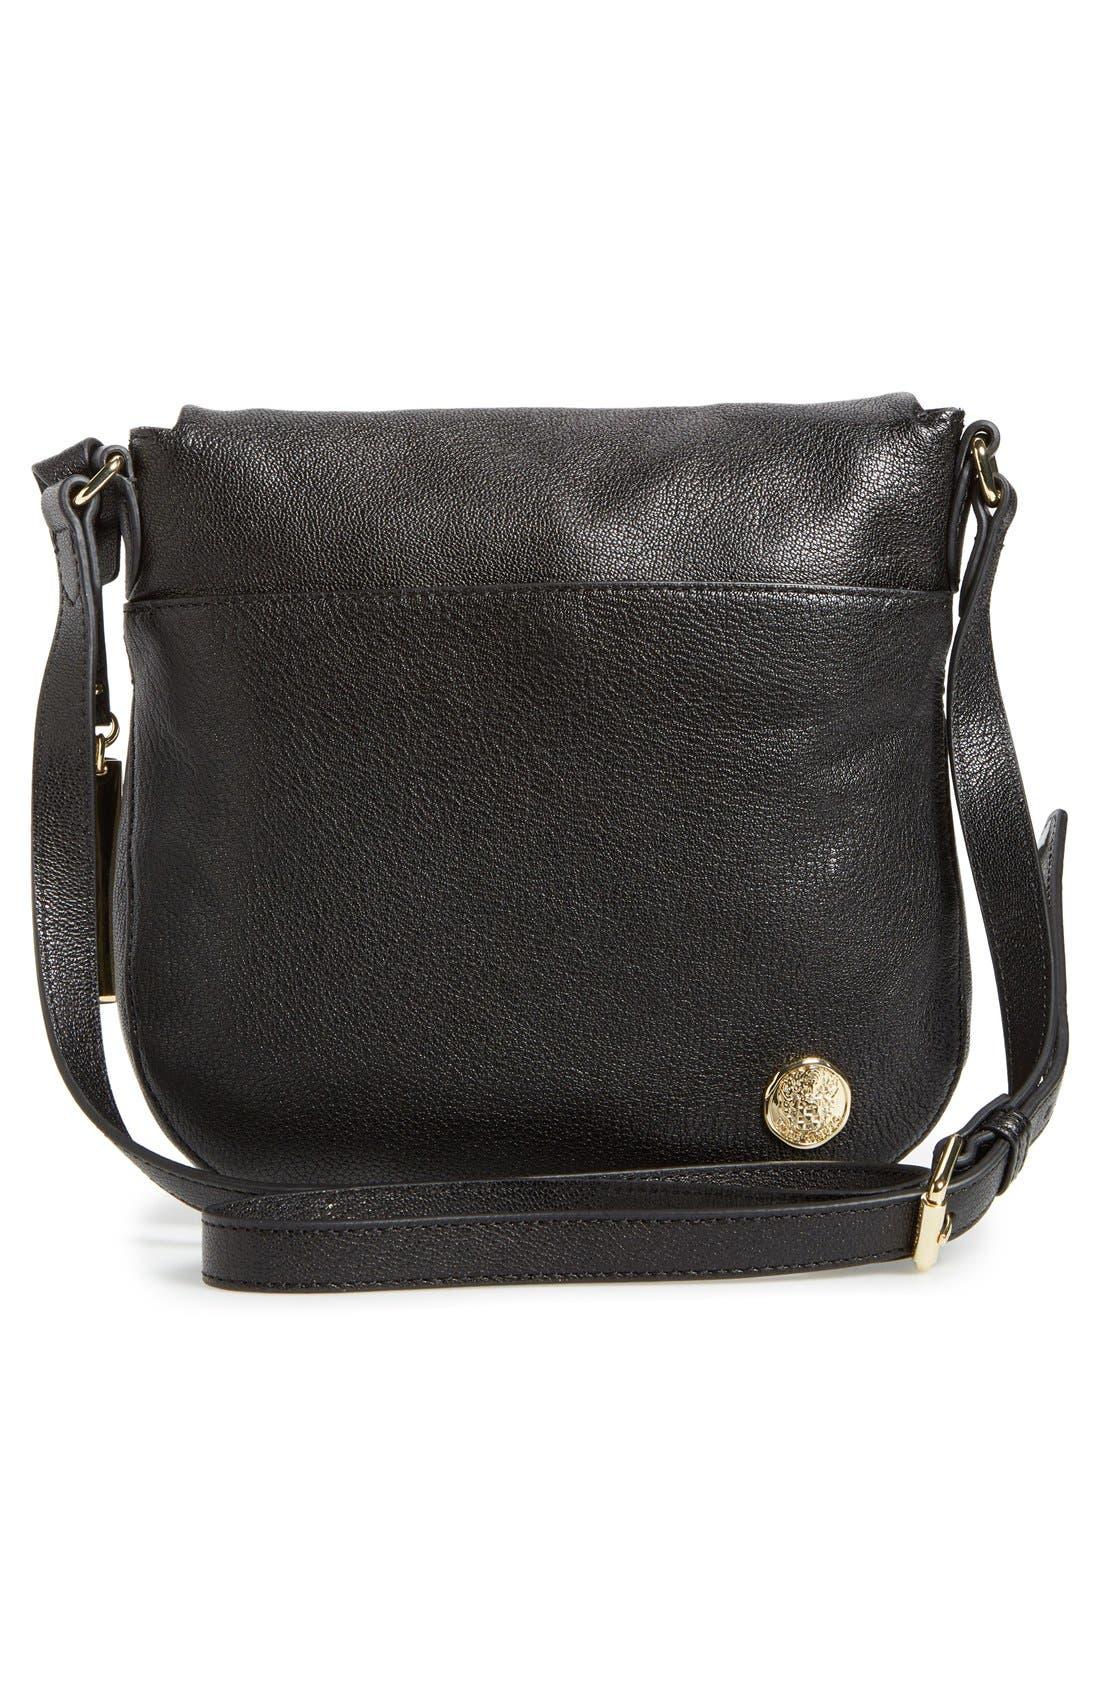 'Tala' Leather Crossbody Bag,                             Alternate thumbnail 3, color,                             001